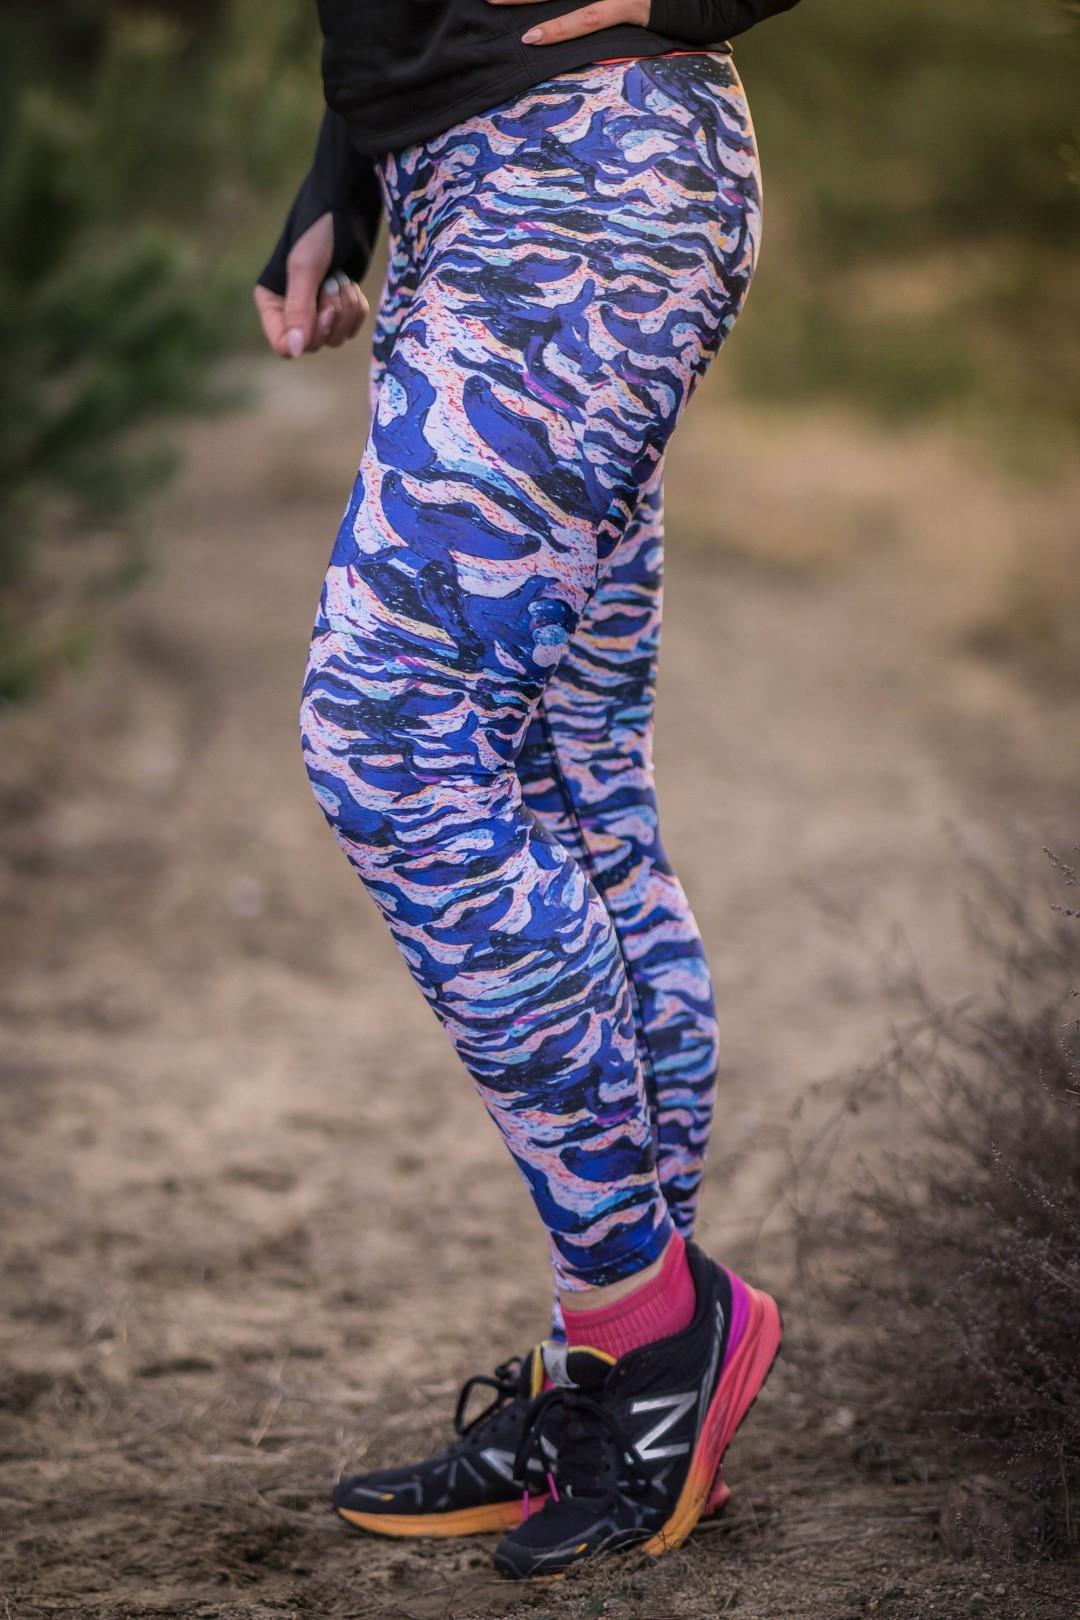 rowe kobiece legginsy do biegania